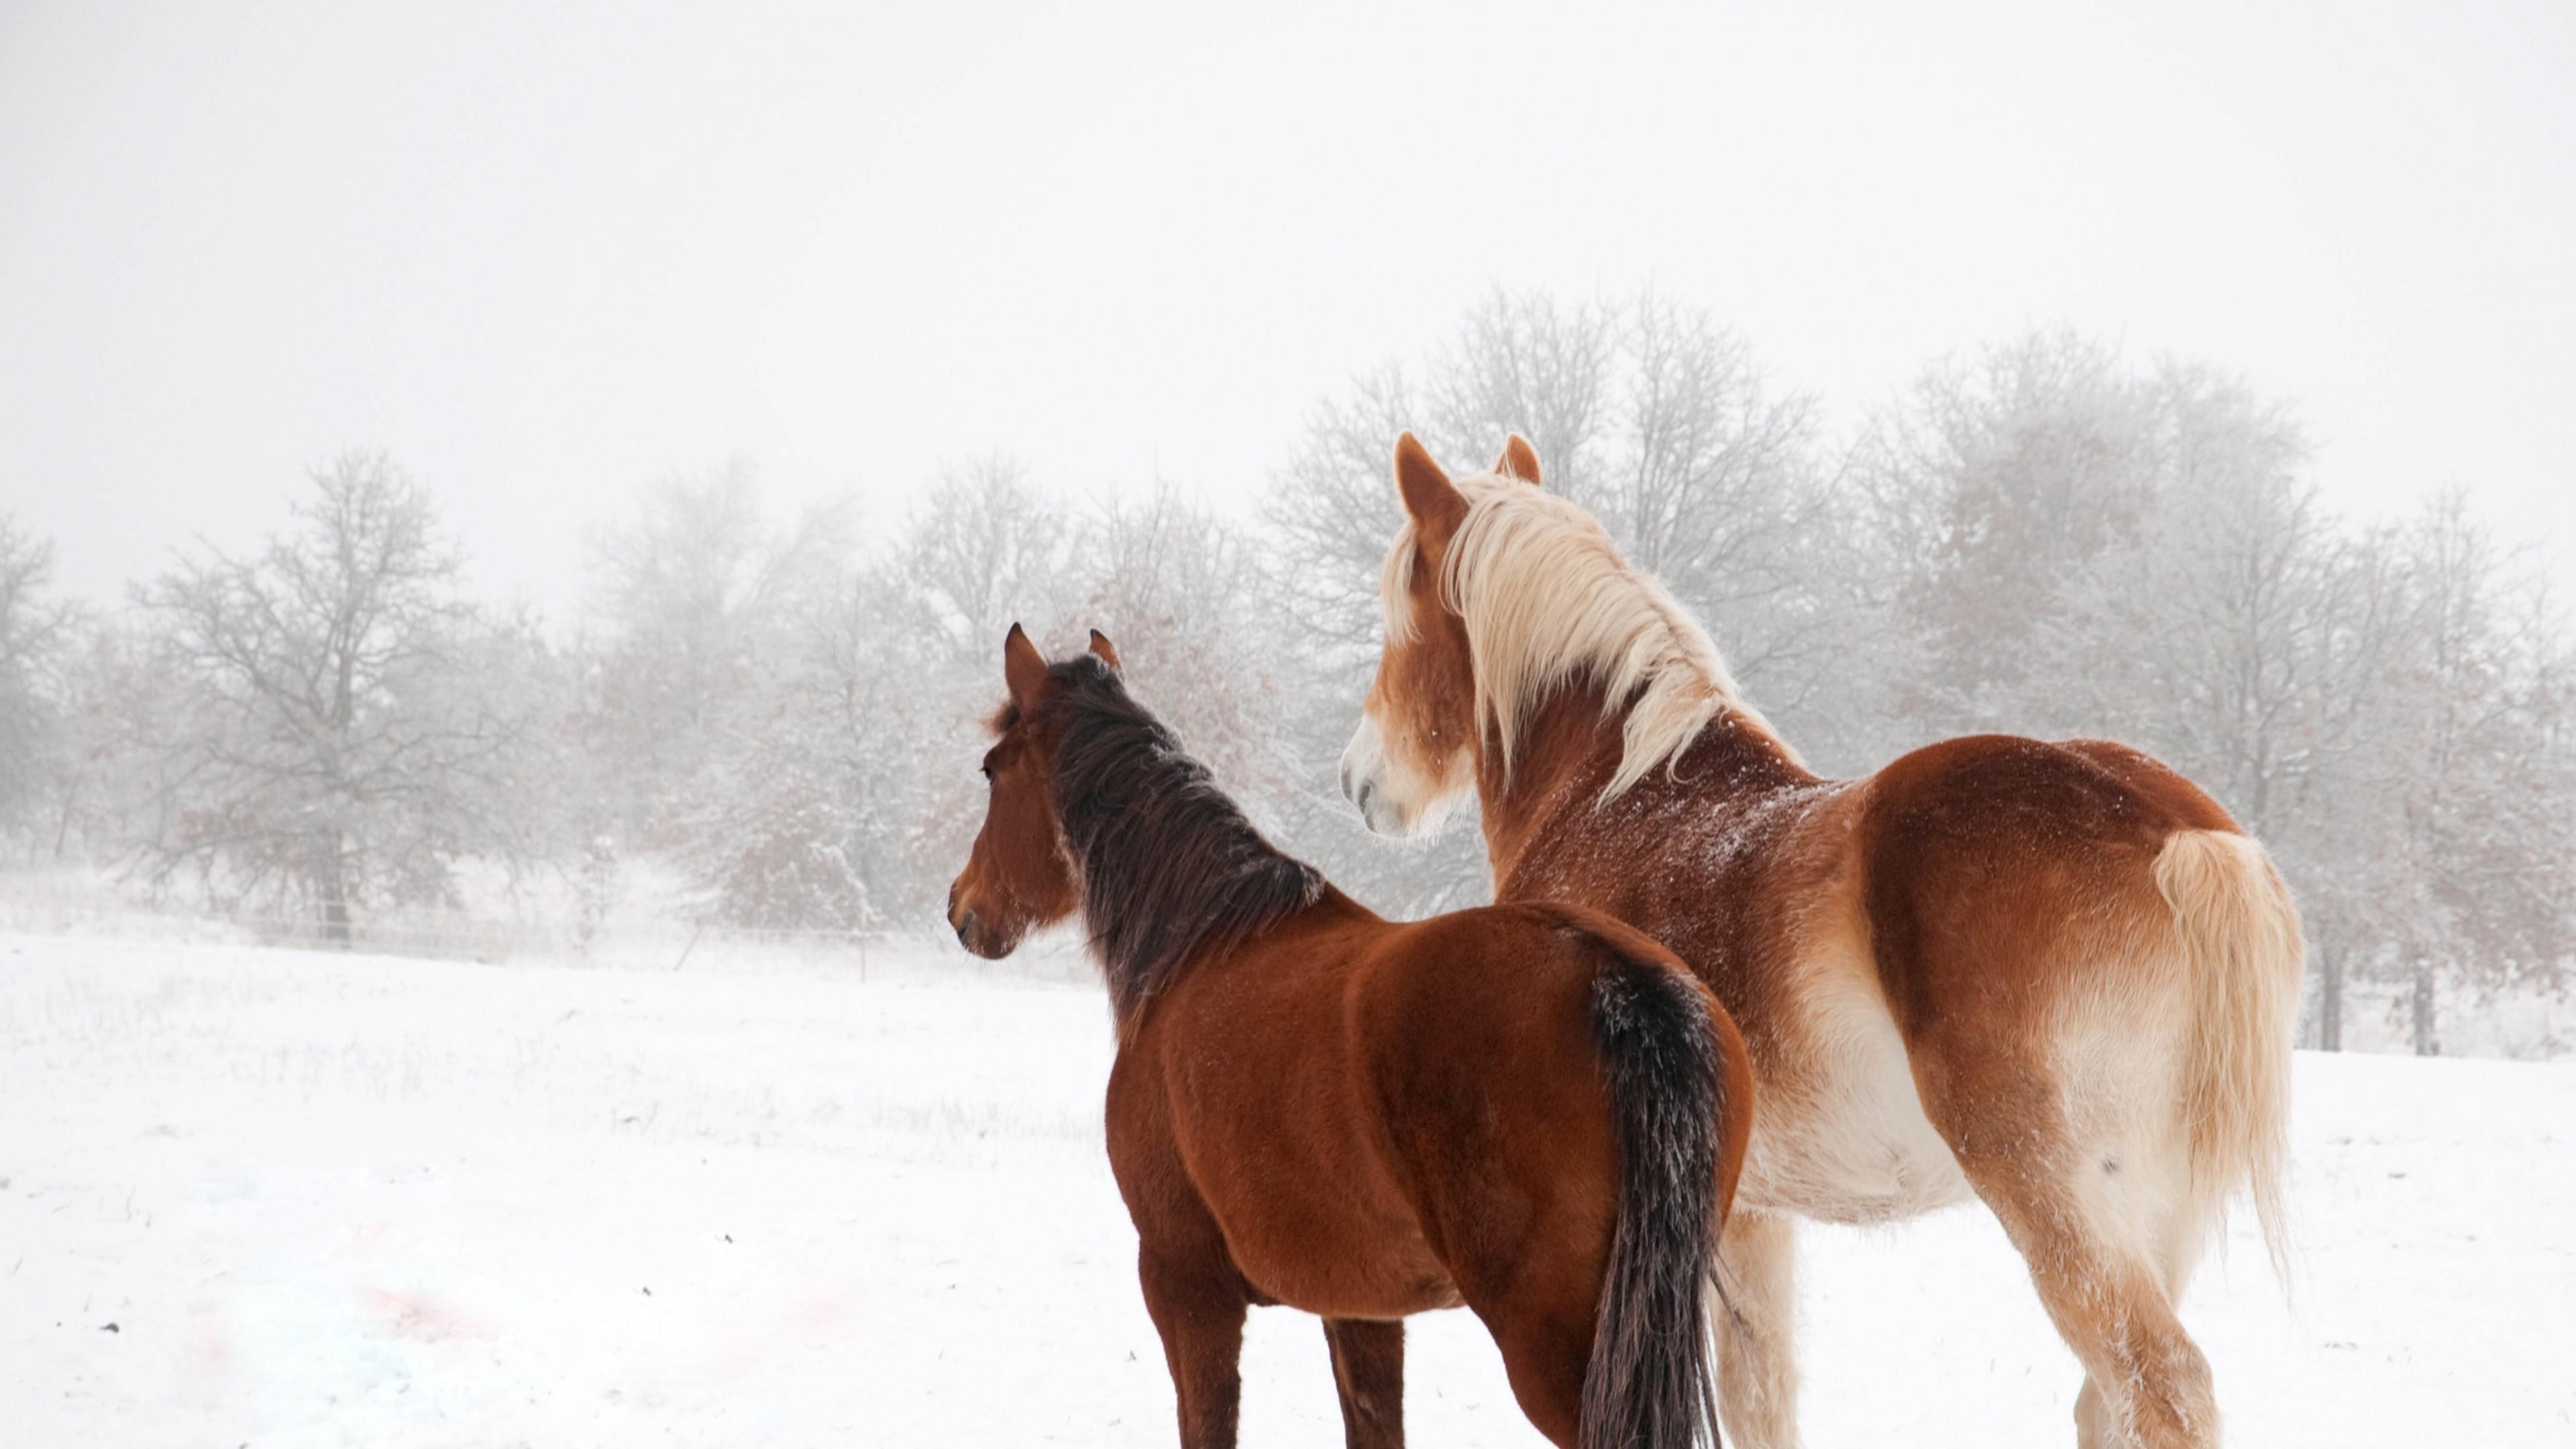 Wallpaper horse, winter, snow, couple